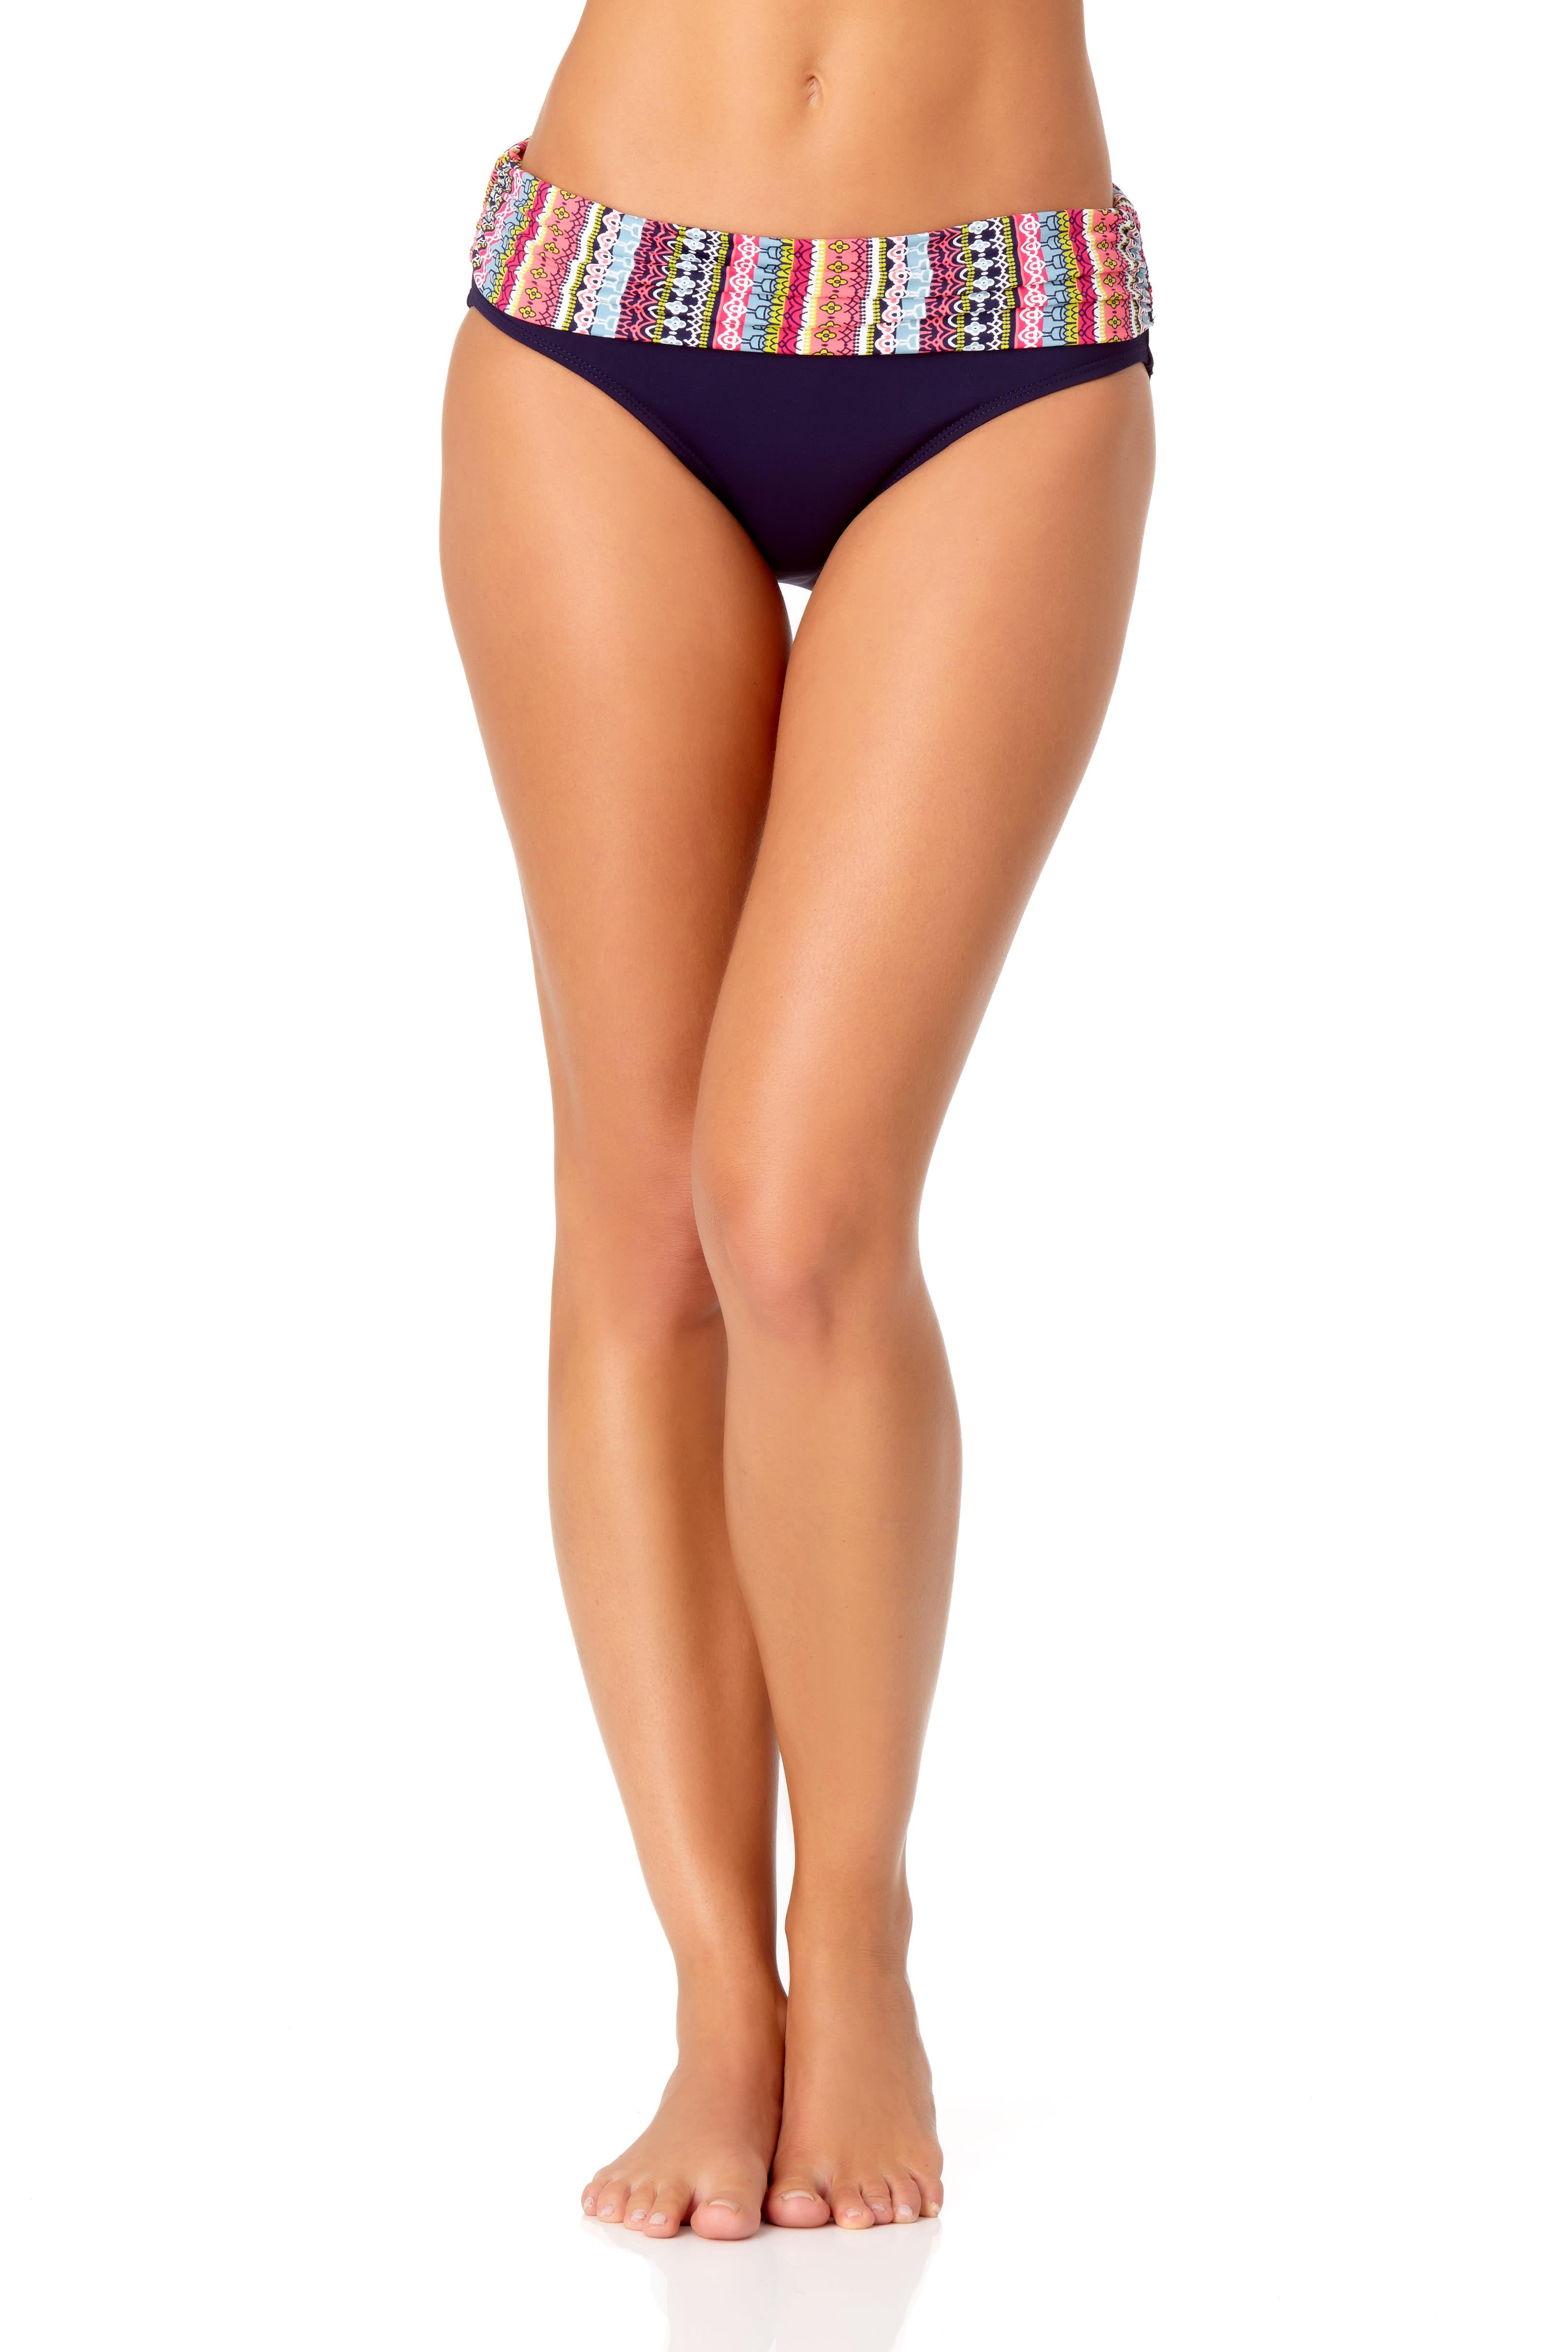 Anne Cole® Jet Set Stripe Foldover Bikini Swimsuit Bottom - Multi - Front